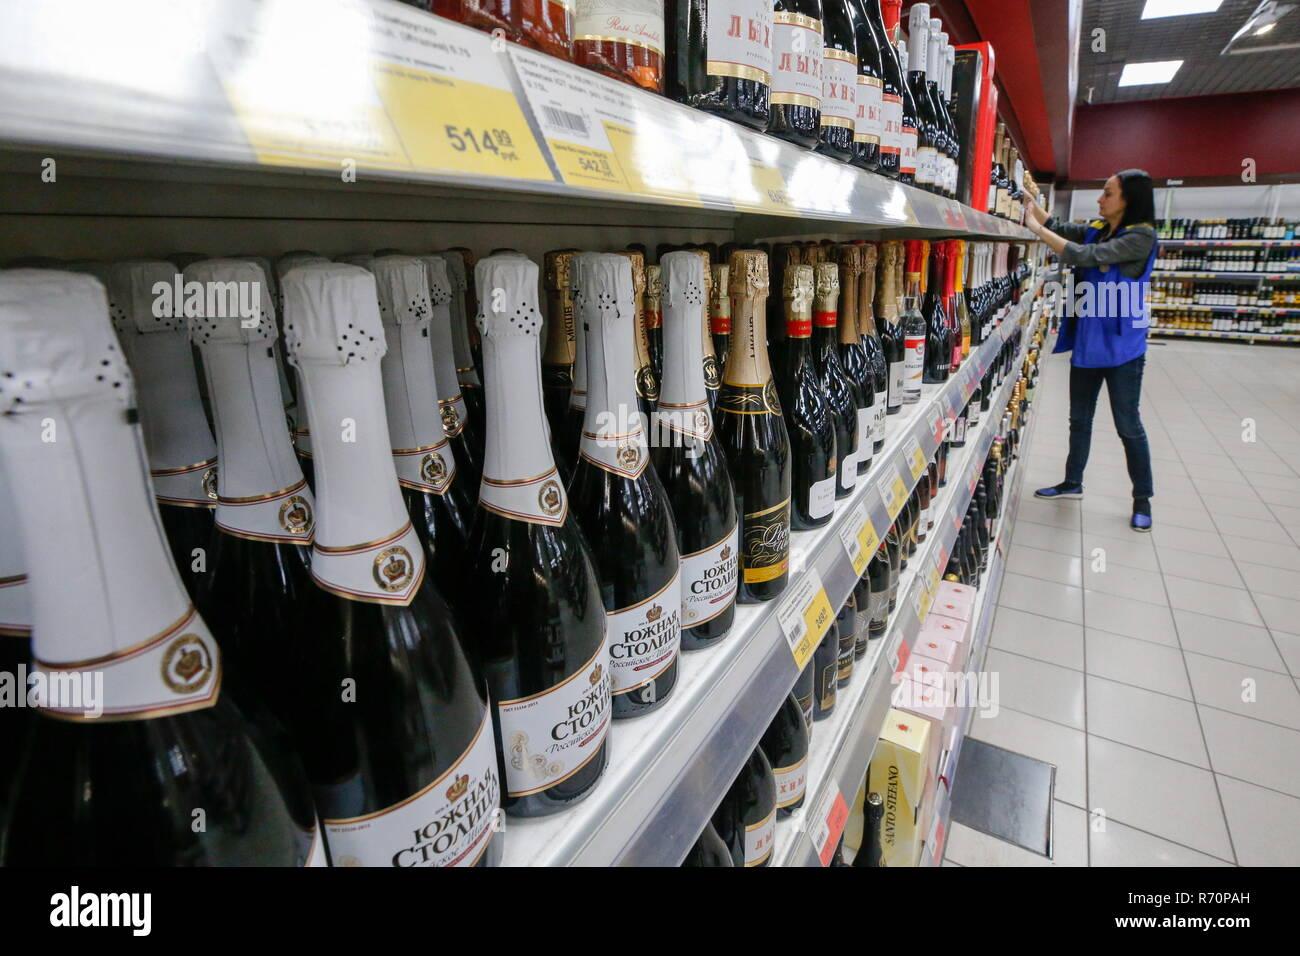 Selling champagne at a Lenta supermarket. Valery Matytsin/TASS Credit: ITAR-TASS News Agency/Alamy Live News - Stock Image